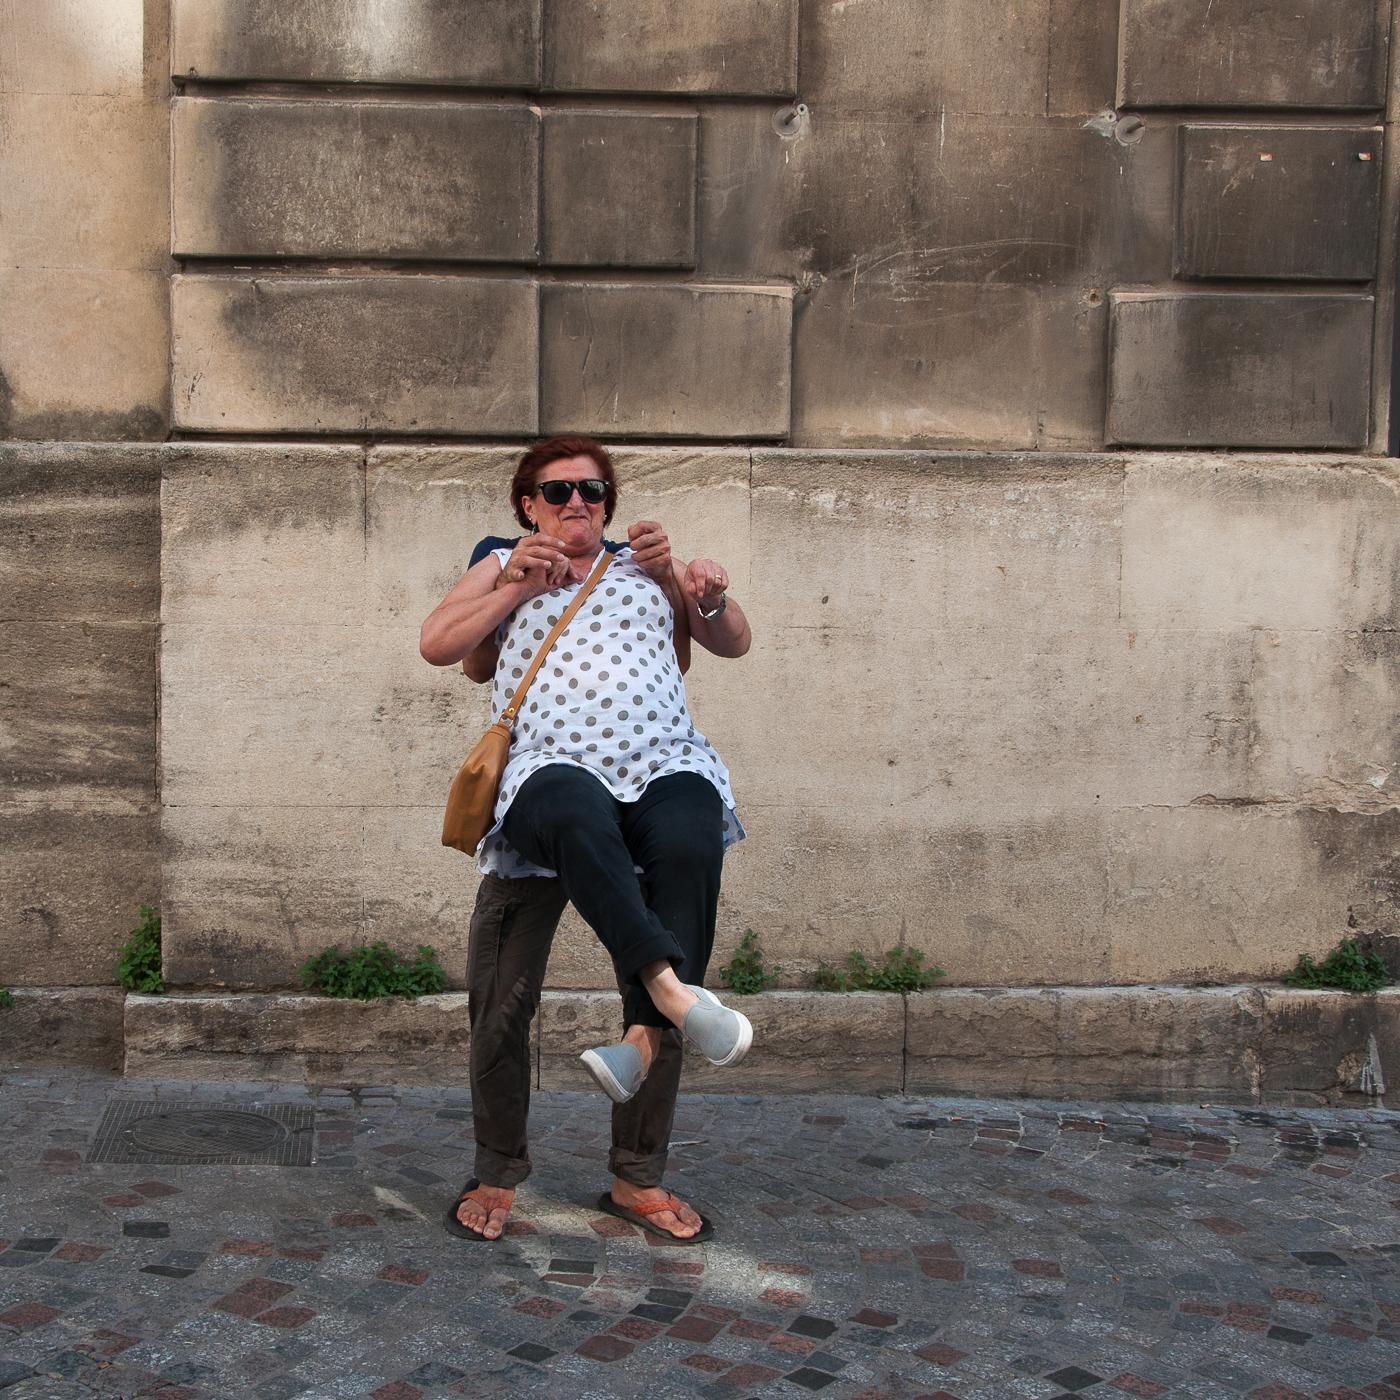 Arles_2015_-_Pieds_croisés